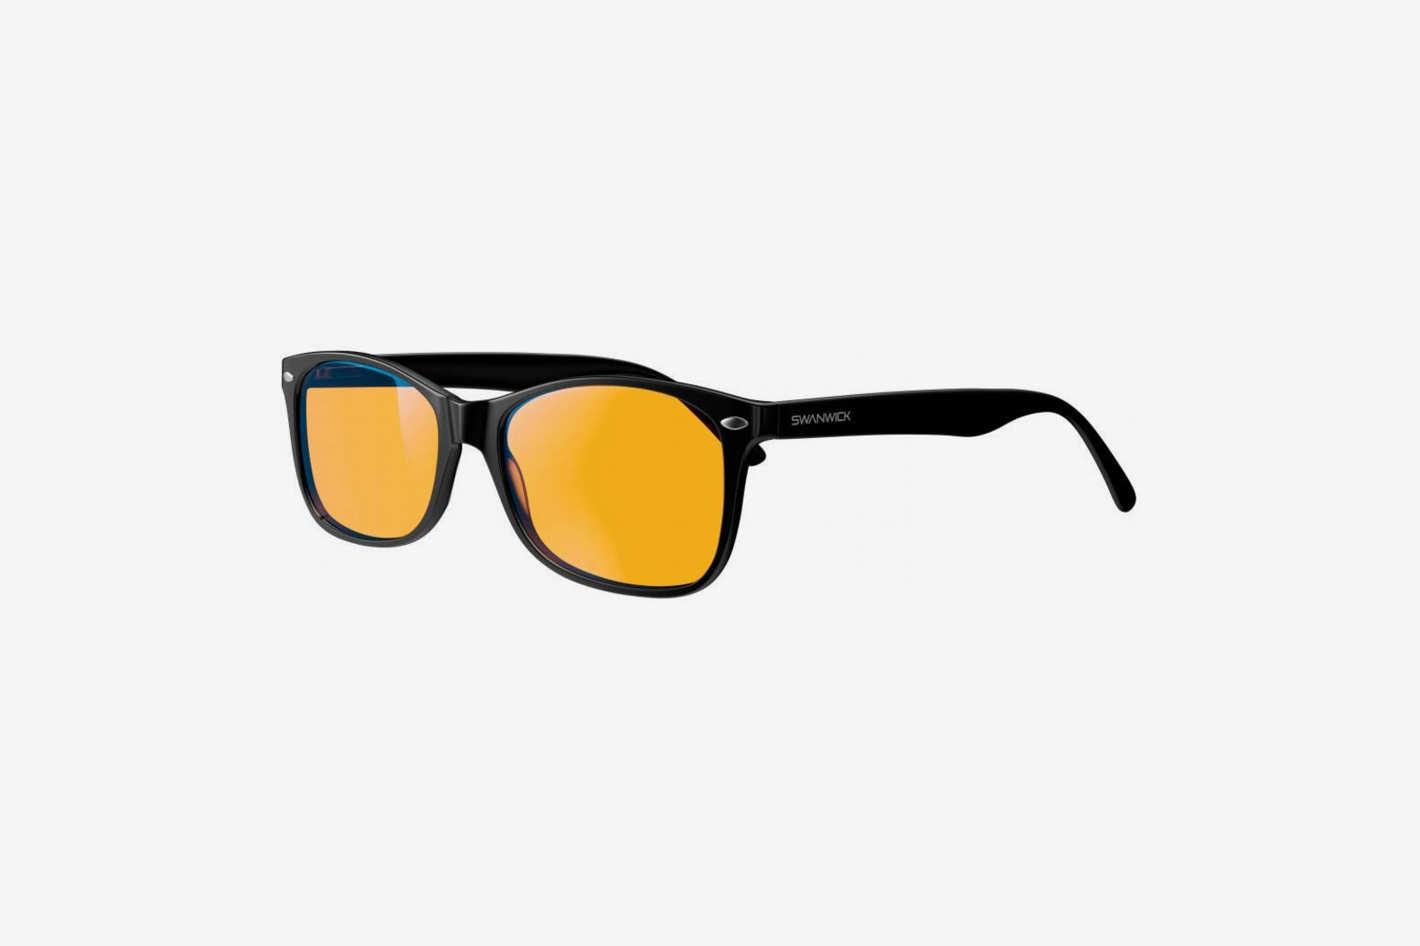 blue-light-blocking-glasses-swannies-gamer-and-computer-eyewear-.w710.h473.2x.jpg